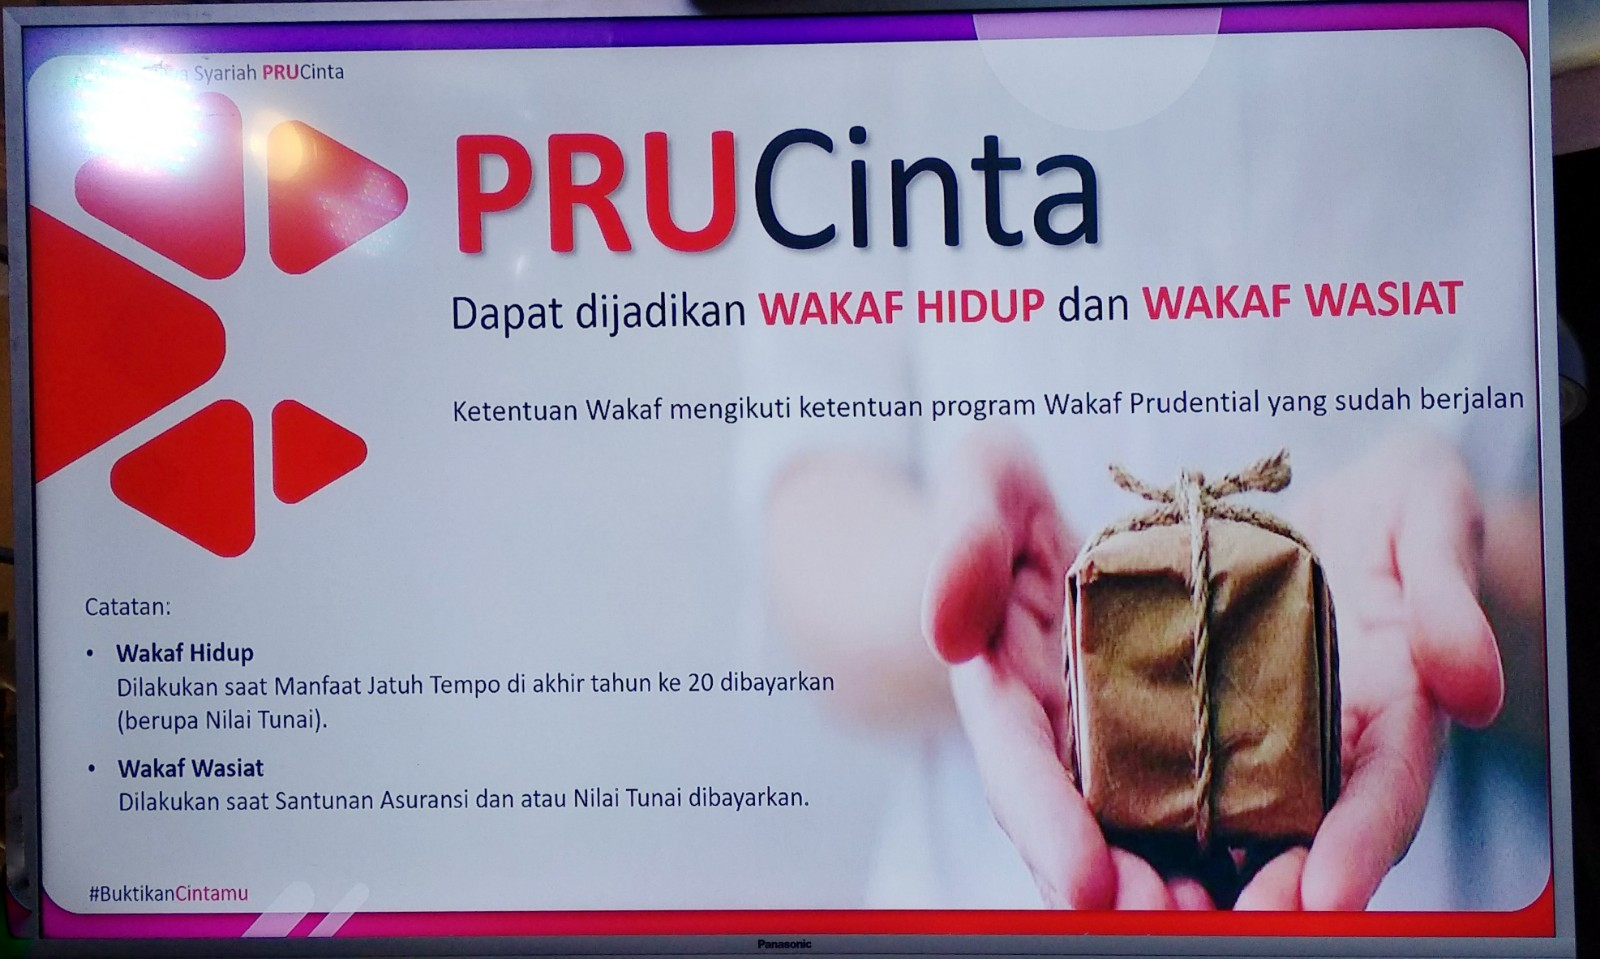 asuransi jiwa syariah PRUCinta 7